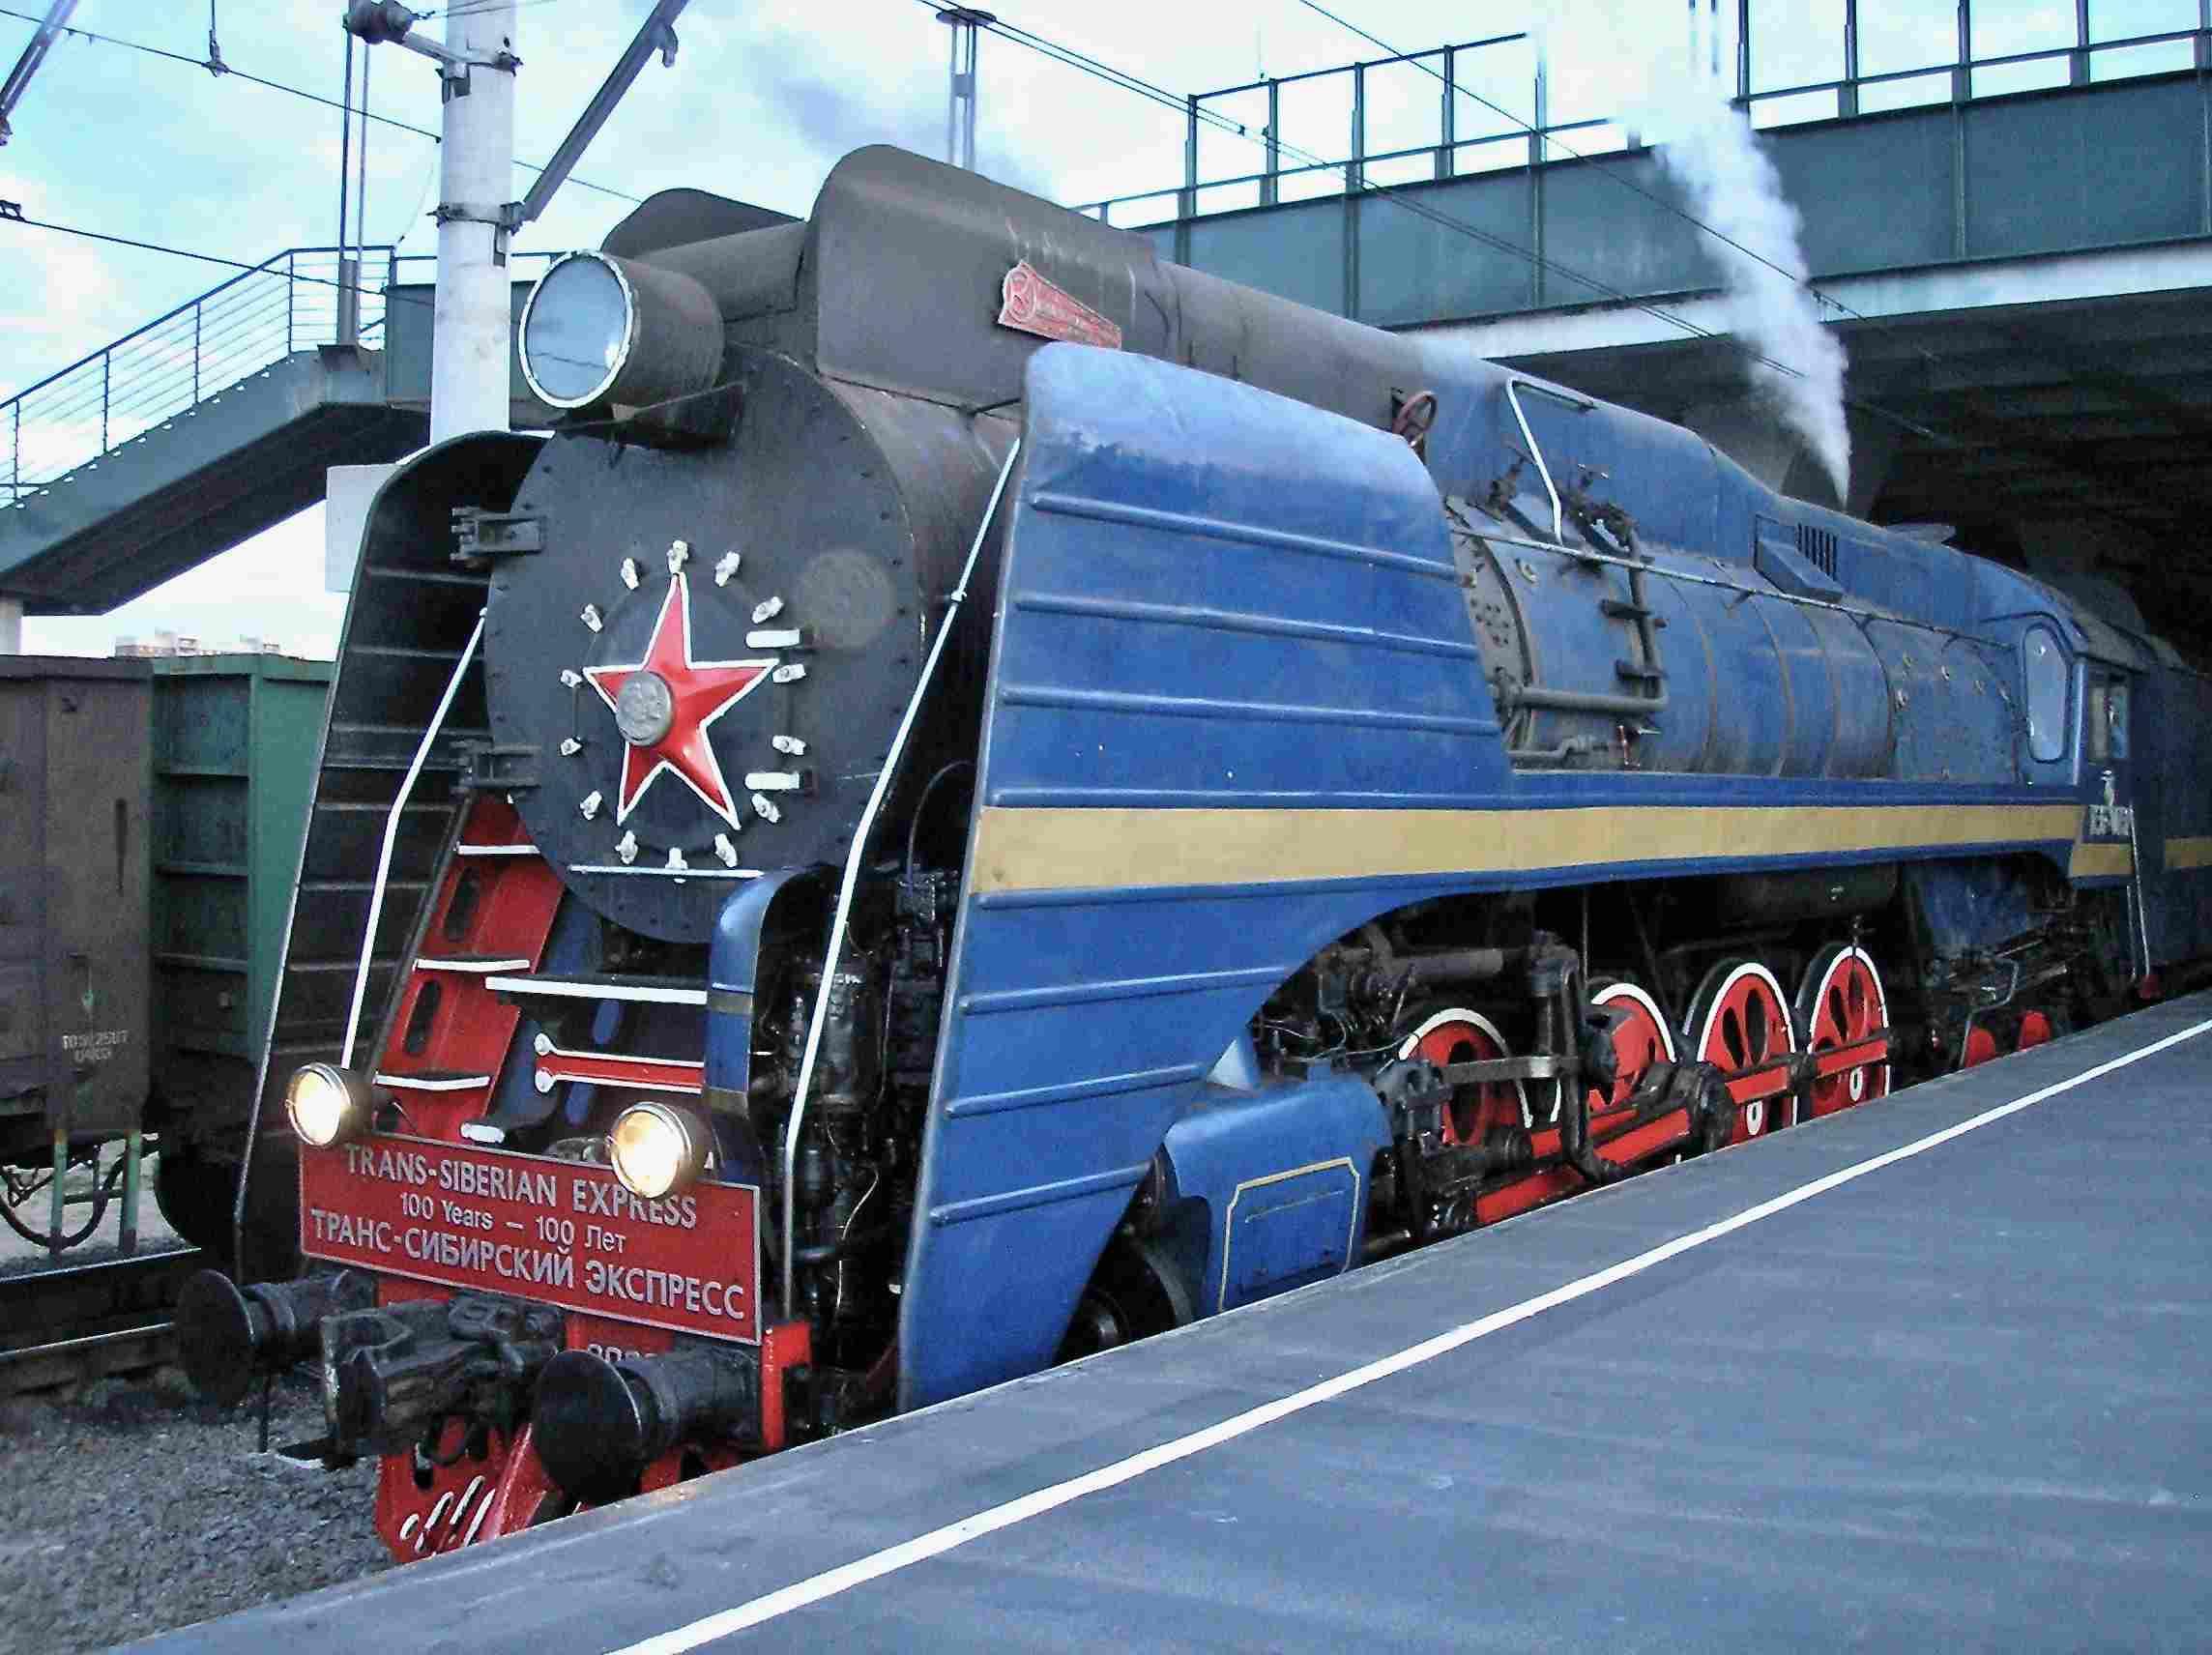 trans-siberian express in Vladivostok